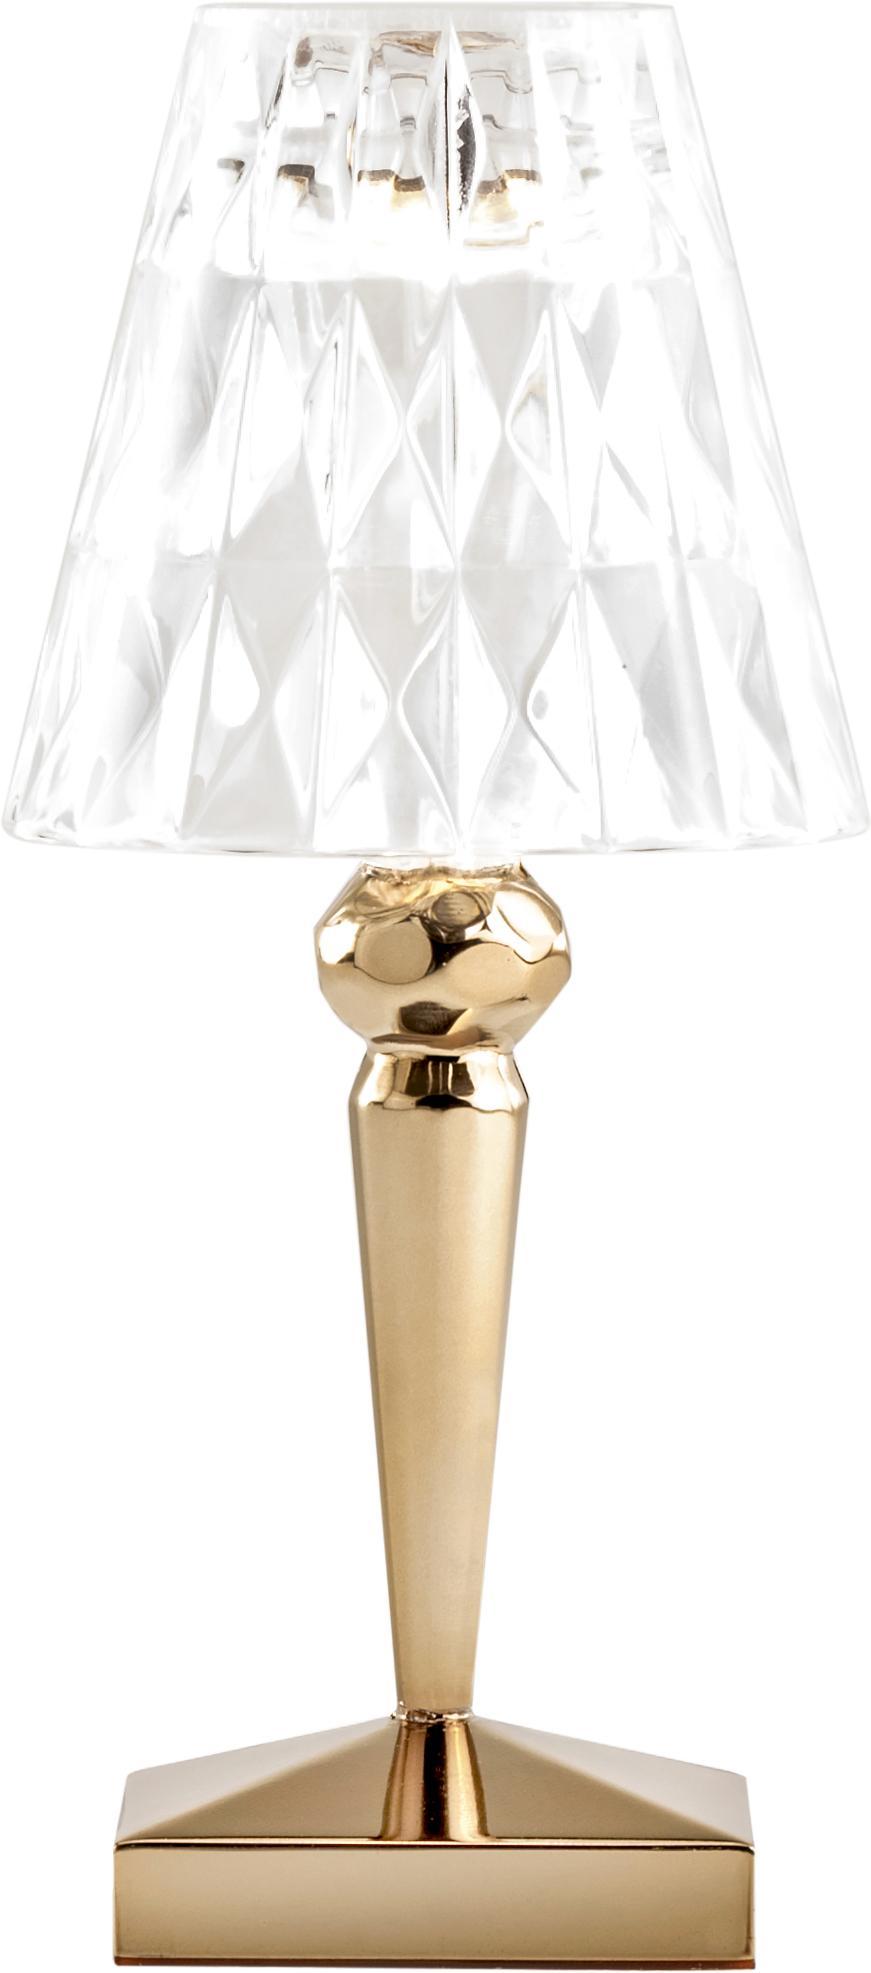 Design LED tafellamp Battery, Goudkleurig, transparant, Ø 12 x H 26 cm